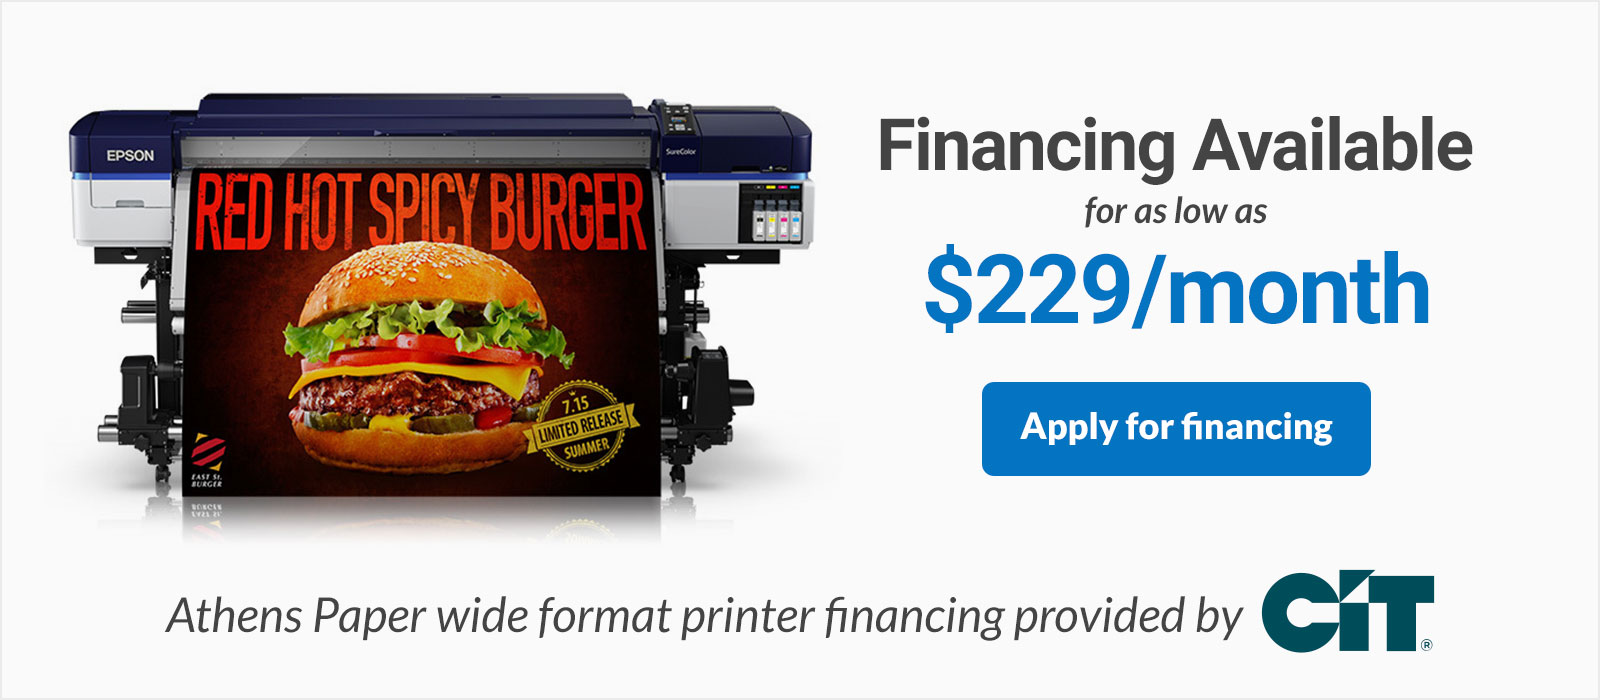 Epson SureColor Printer Financing 64 Inch S40600 Large Format Printer